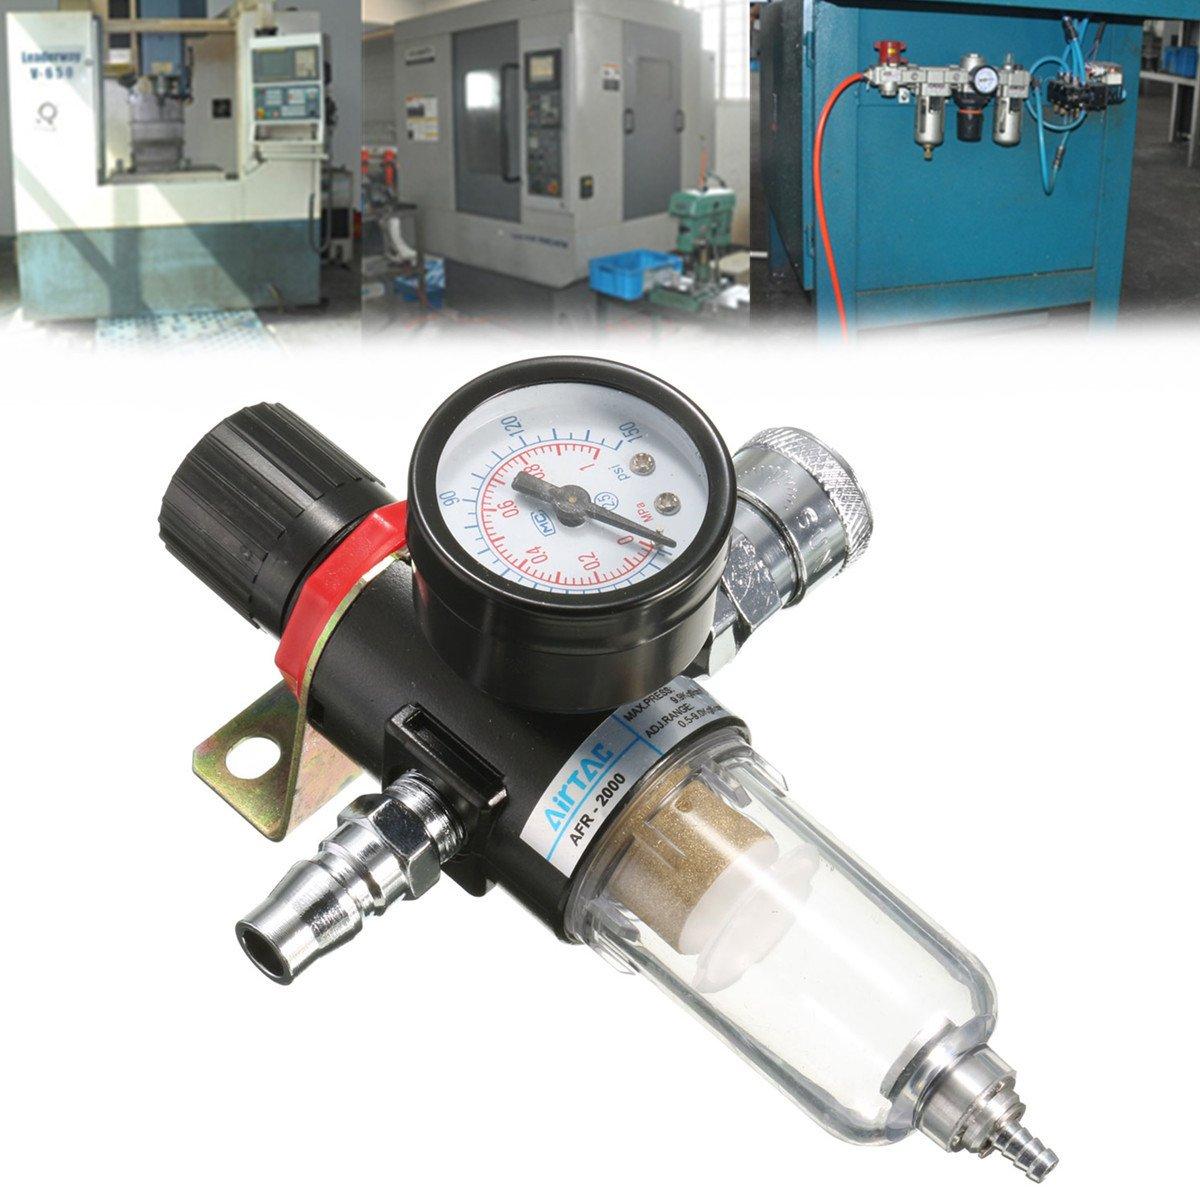 QOJA afr-2000 1/4'' air compressor filter water separator trap by QOJA (Image #2)